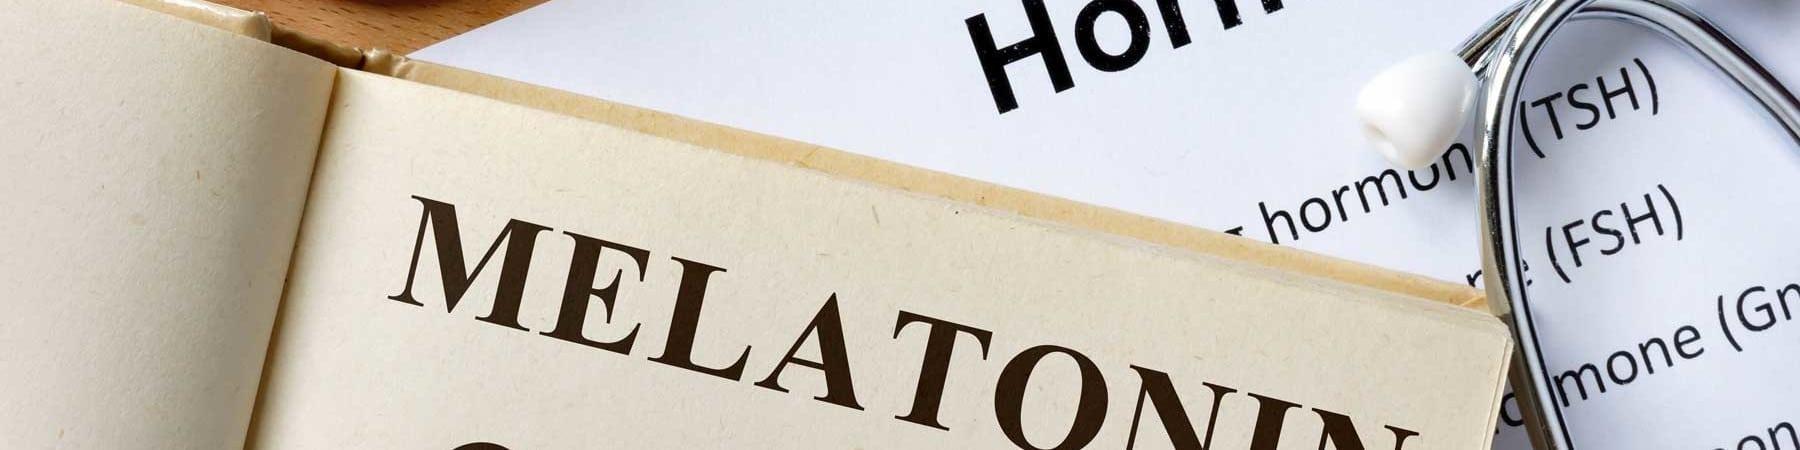 Melatonin: The Master Circadian Rhythm Regulator